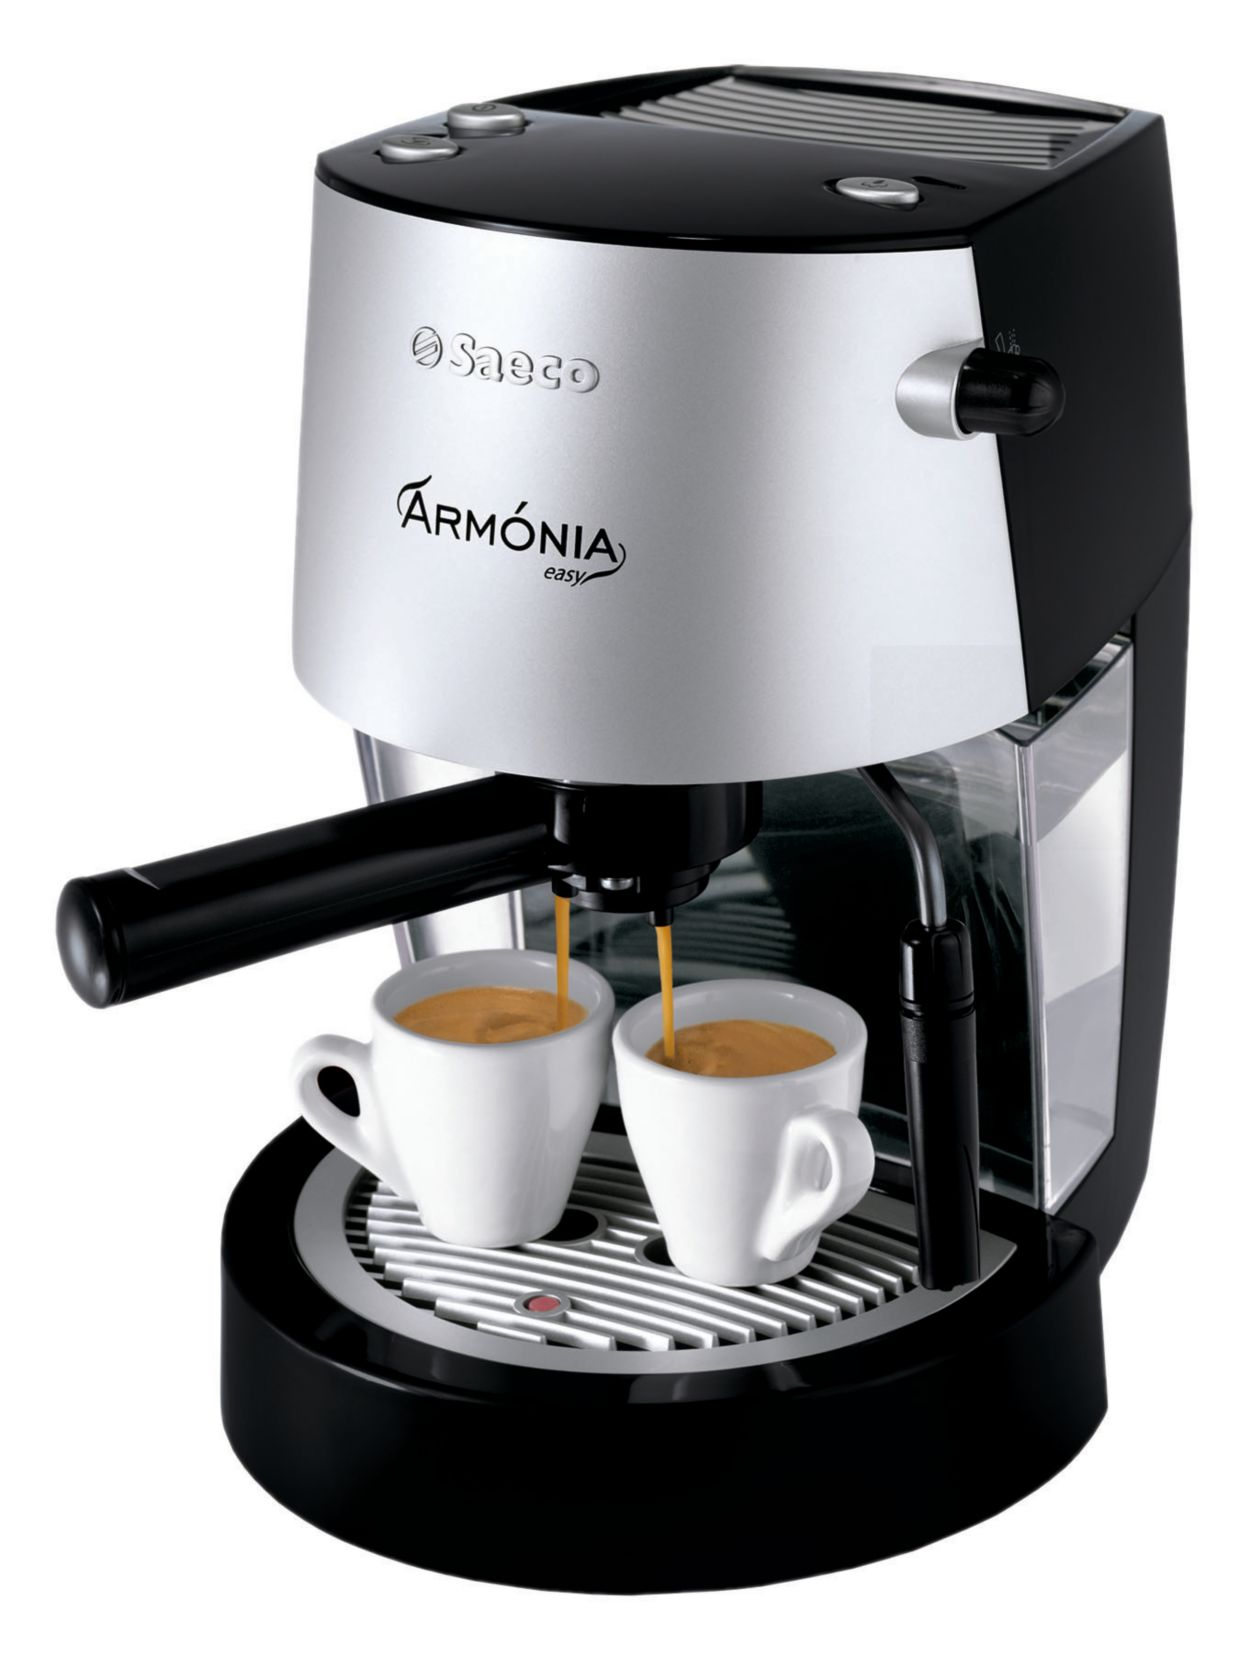 Electronic Saeco Coffee Machine Manual armonia manual espresso machine ri933001 saeco the pleasure and quality of espresso